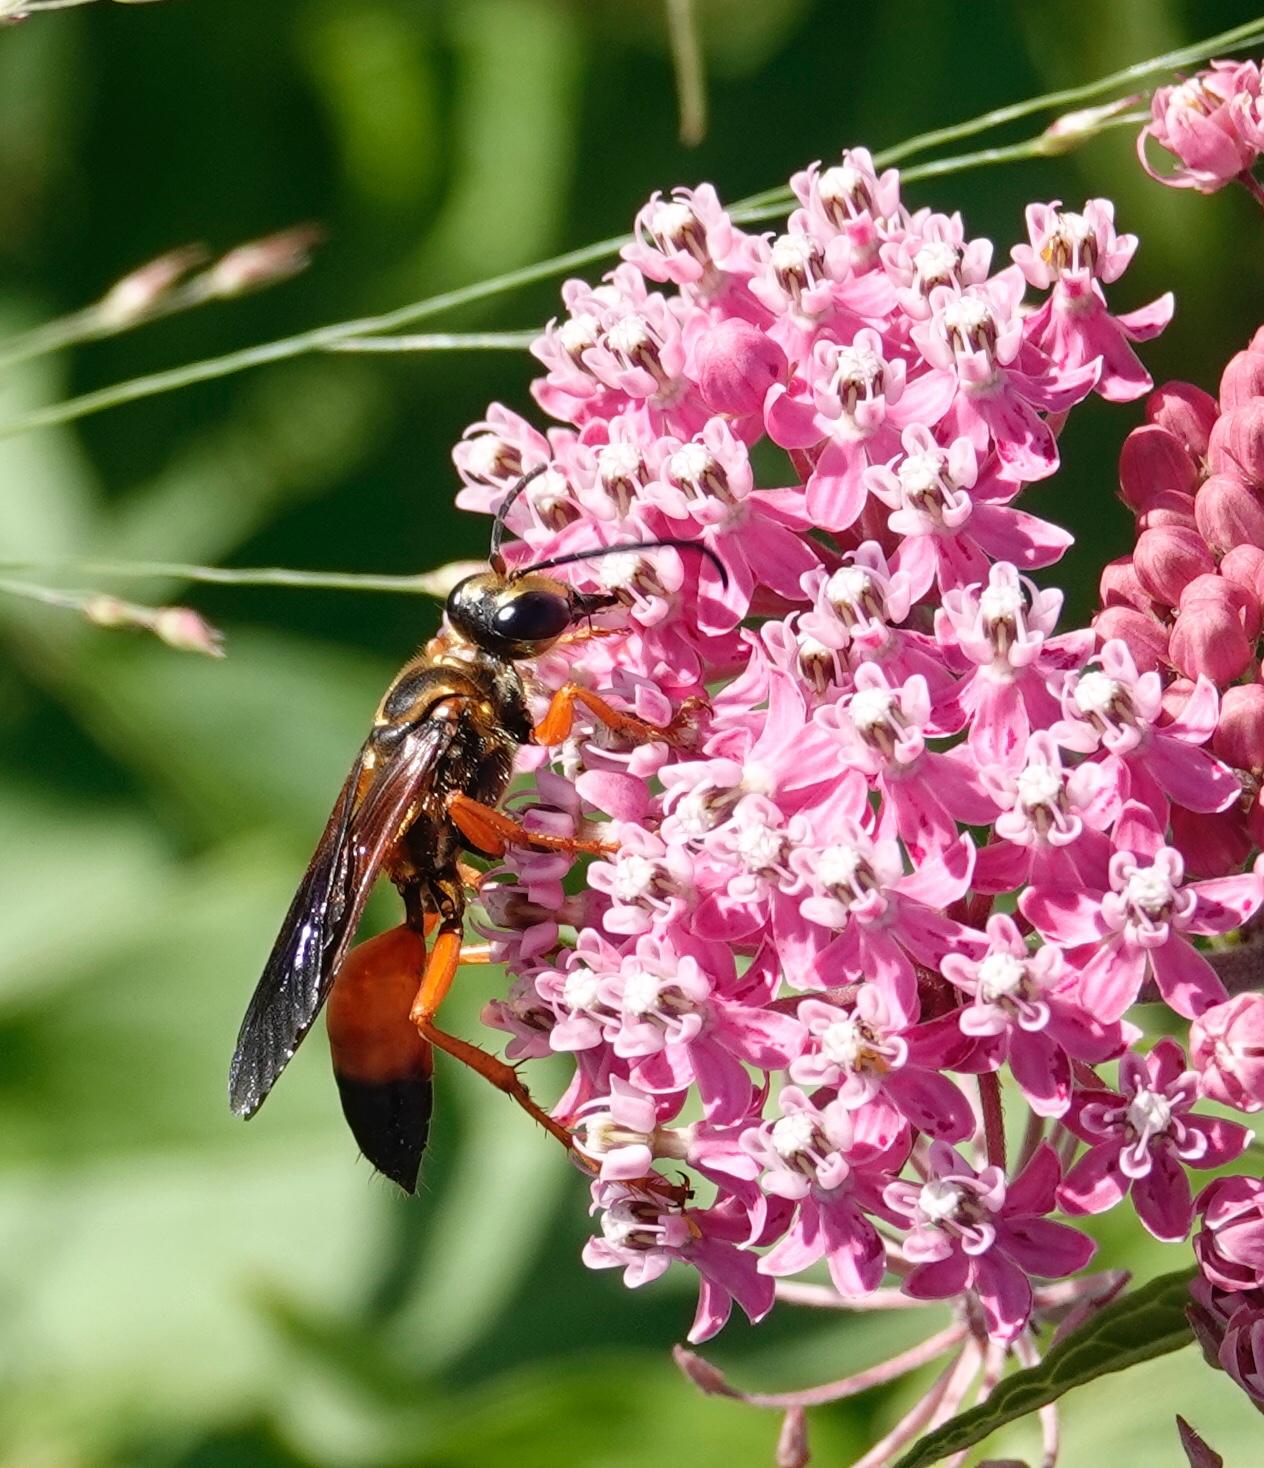 The great golden digger wasp preys upon grasshoppers, crickets and katydids. Al Batt/Albert Lea Tribune